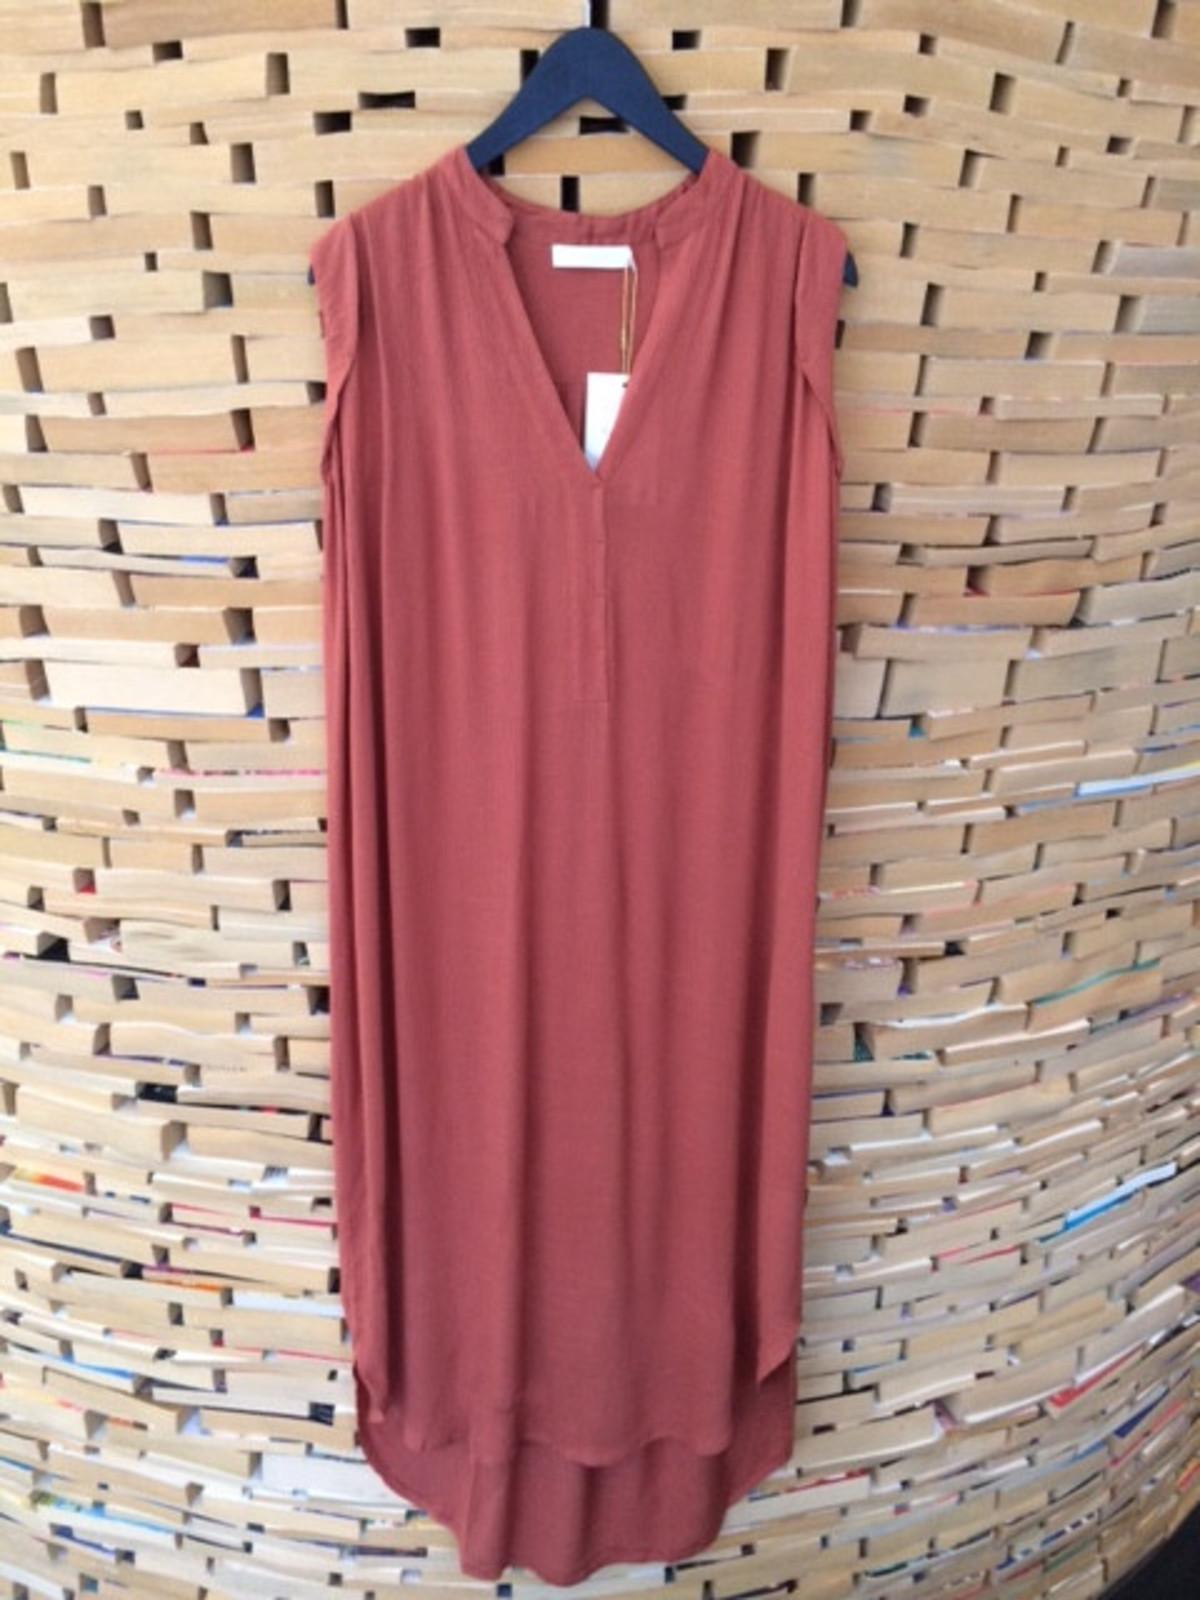 5641a0fc8430 Rabens Saloner Denice Kaftan Dress in Brick